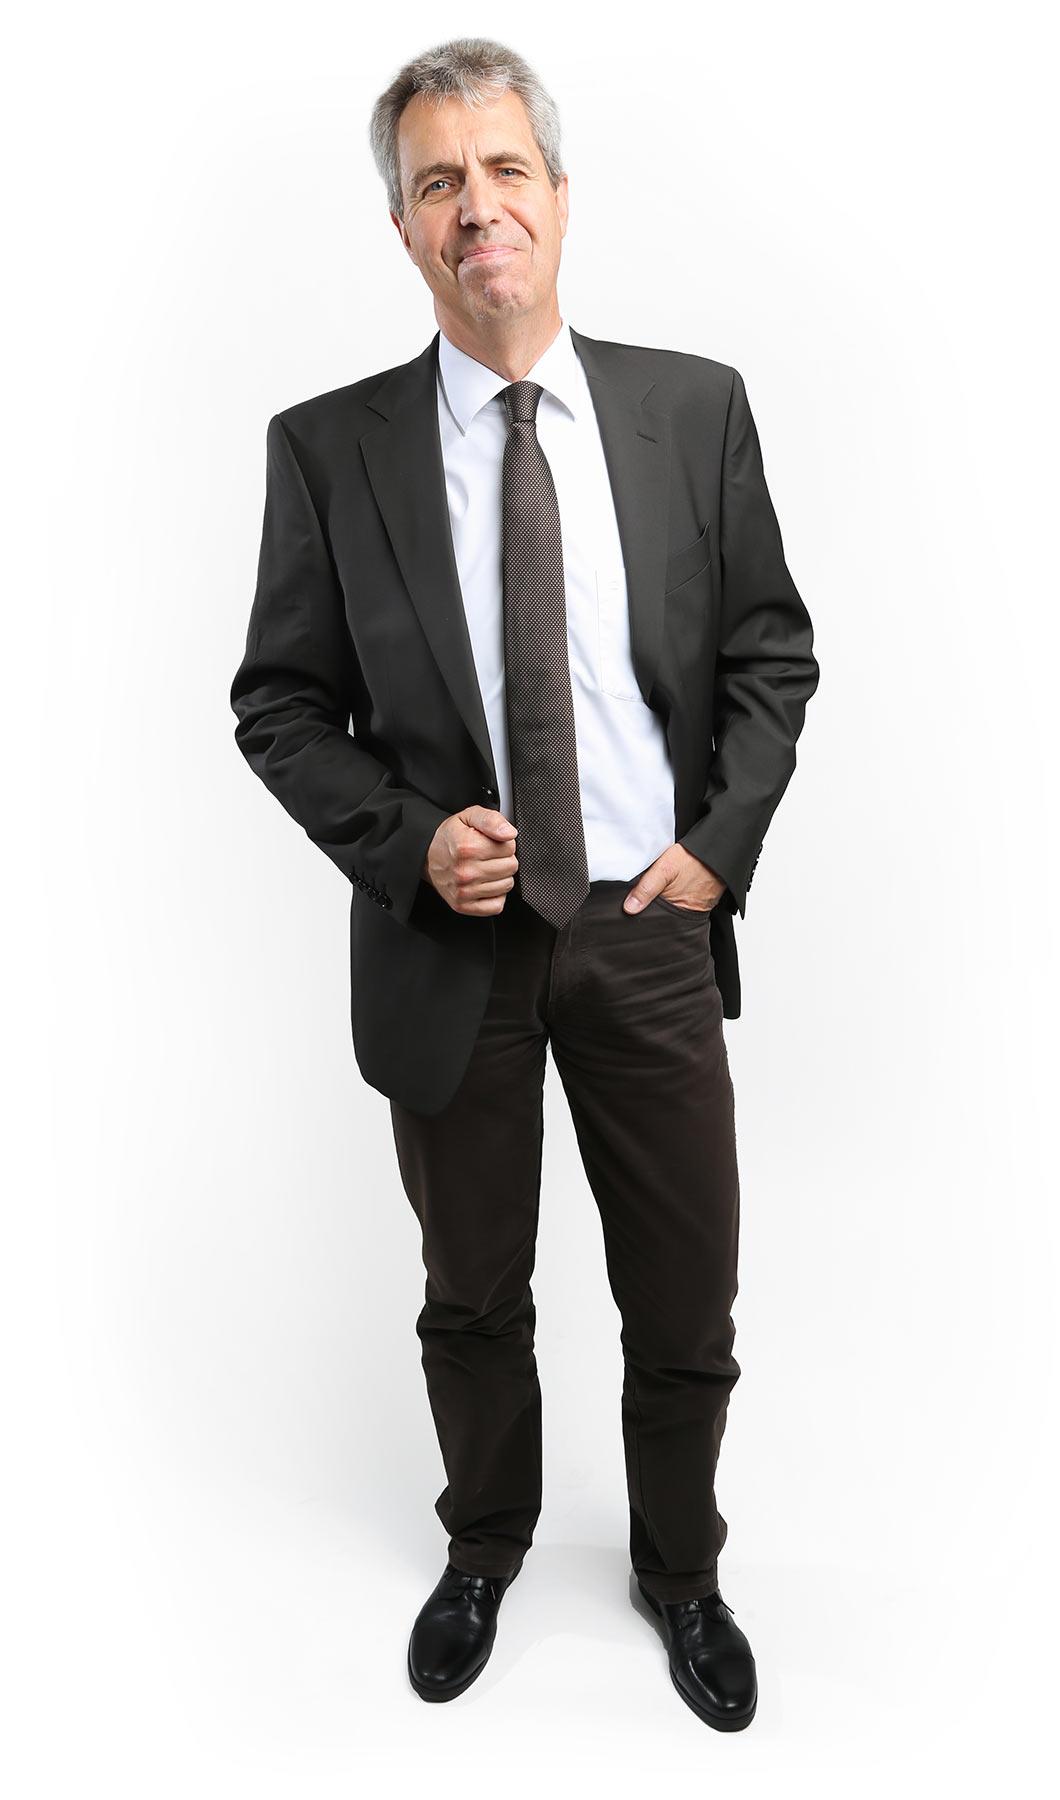 Rechtsanwalt Andreas Proft